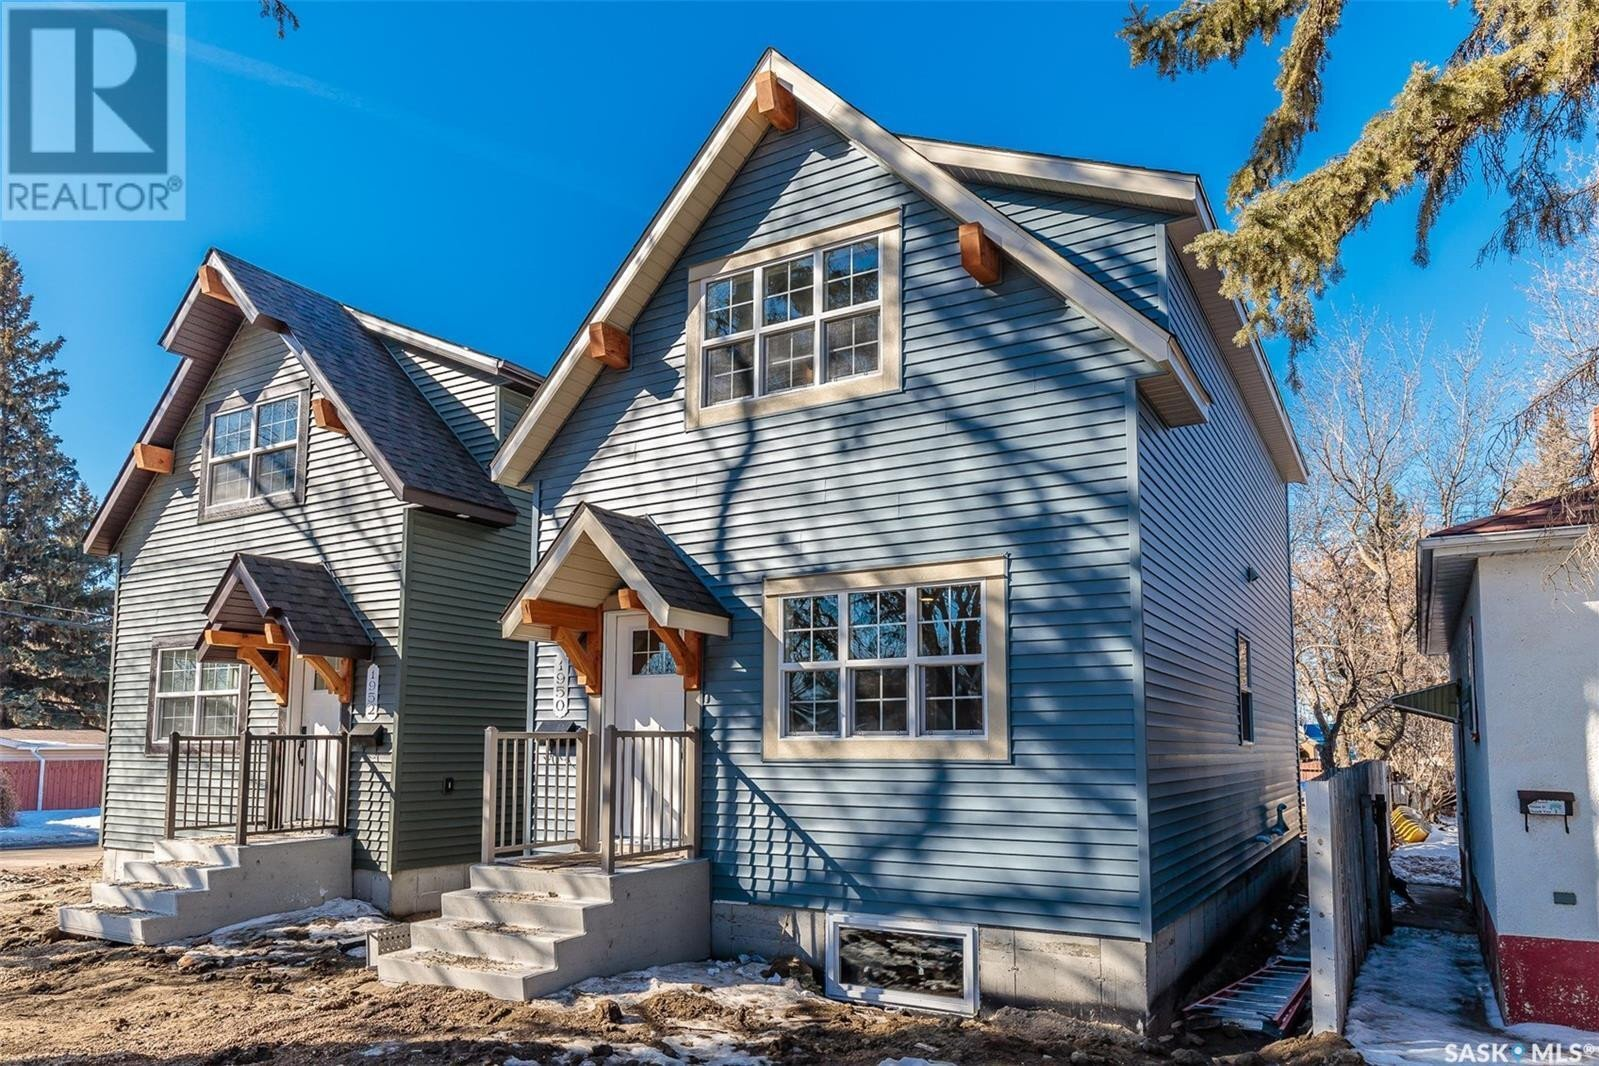 House for sale at B Melrose Ave Unit 2505 Saskatoon Saskatchewan - MLS: SK833684